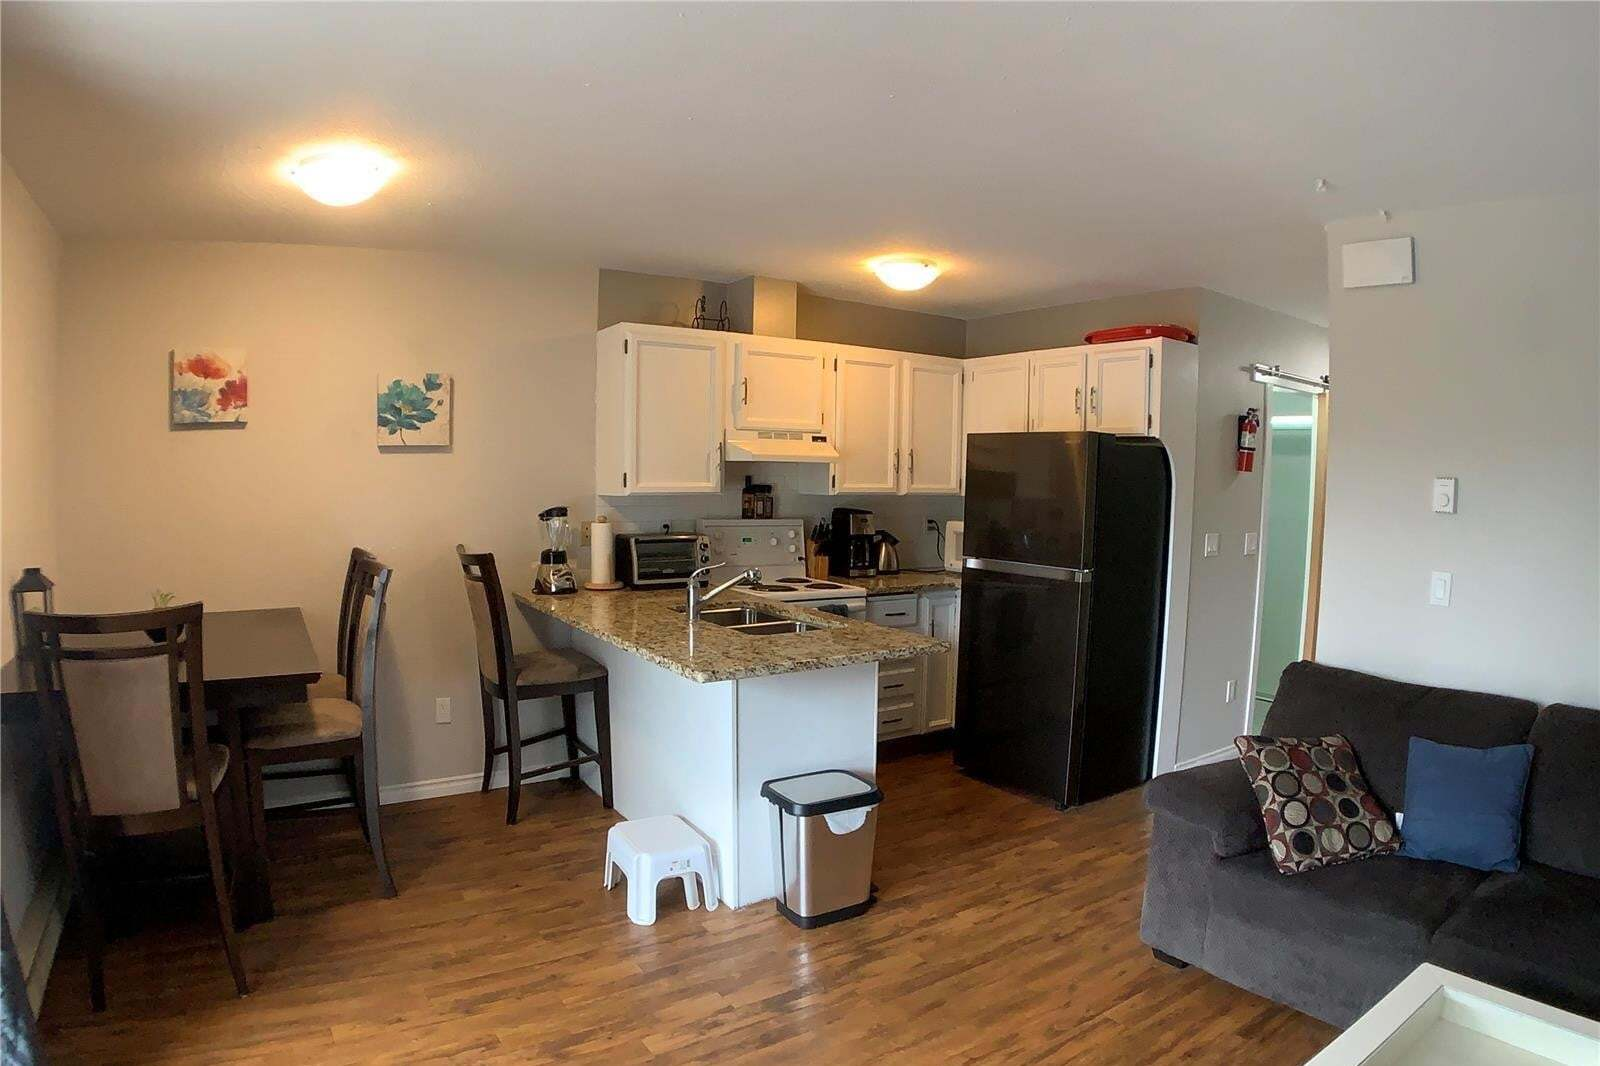 Condo for sale at 2753 Westside Rd West Kelowna British Columbia - MLS: 10204870